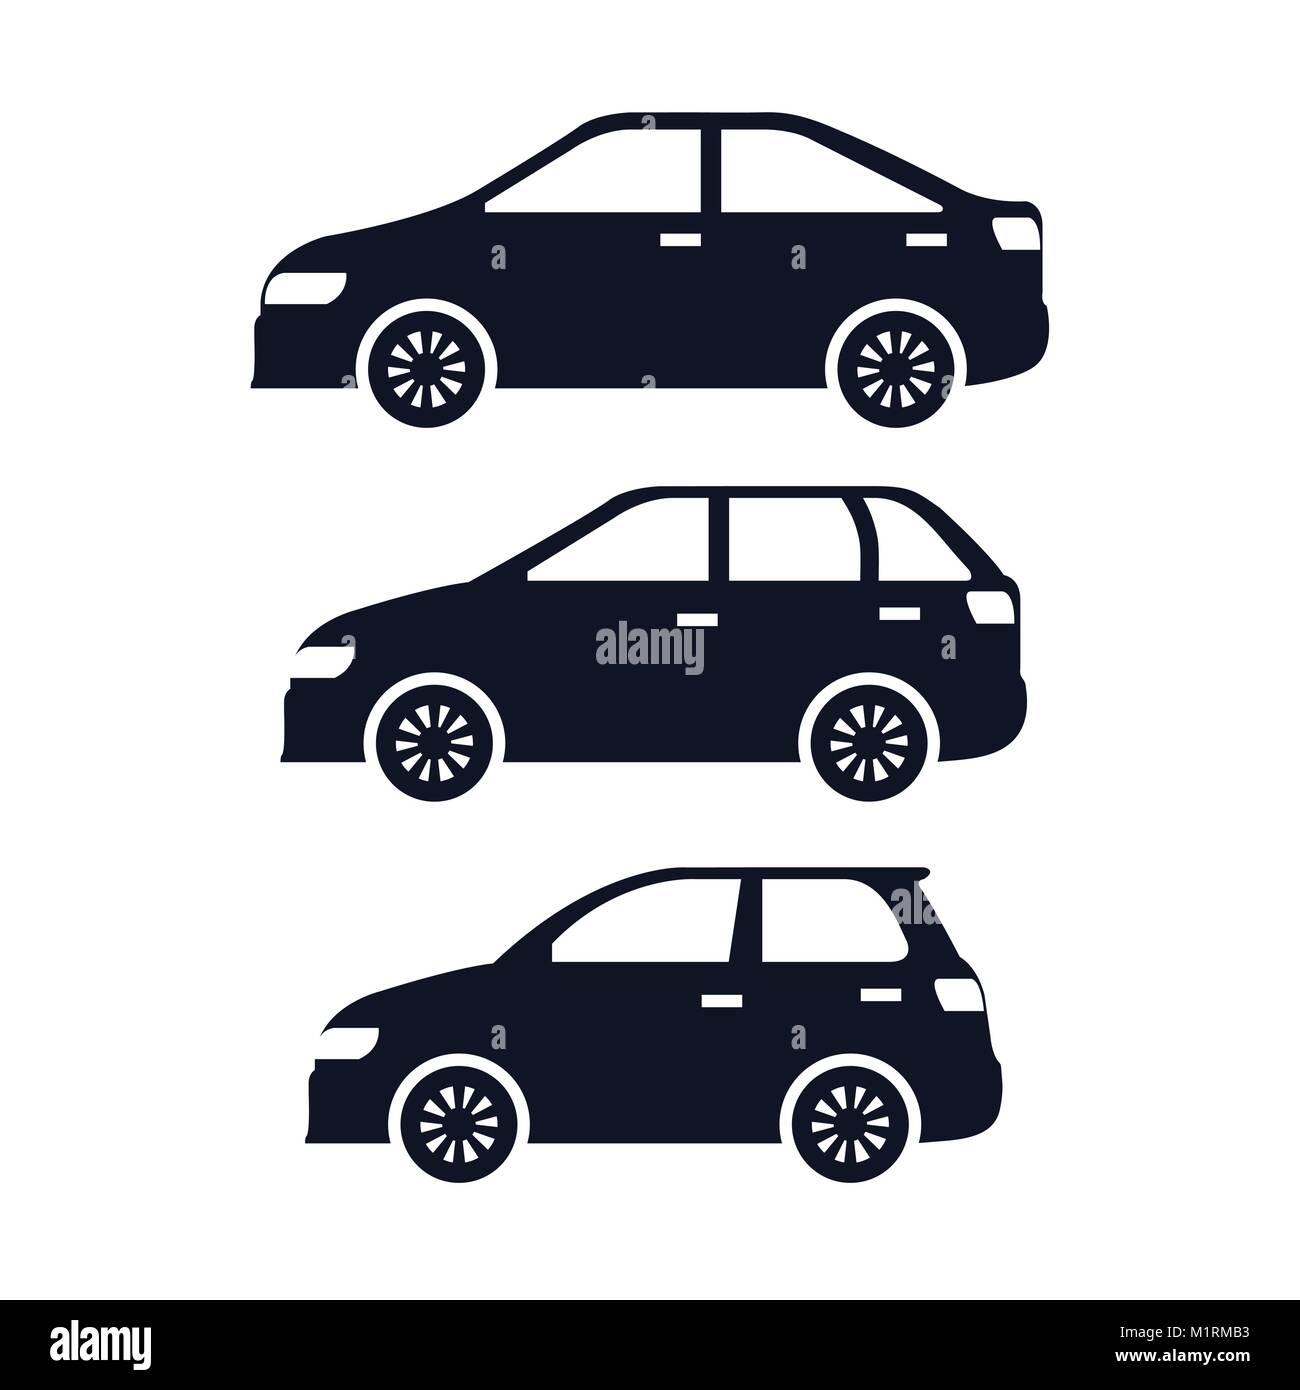 group of cars sedan icons - Stock Image